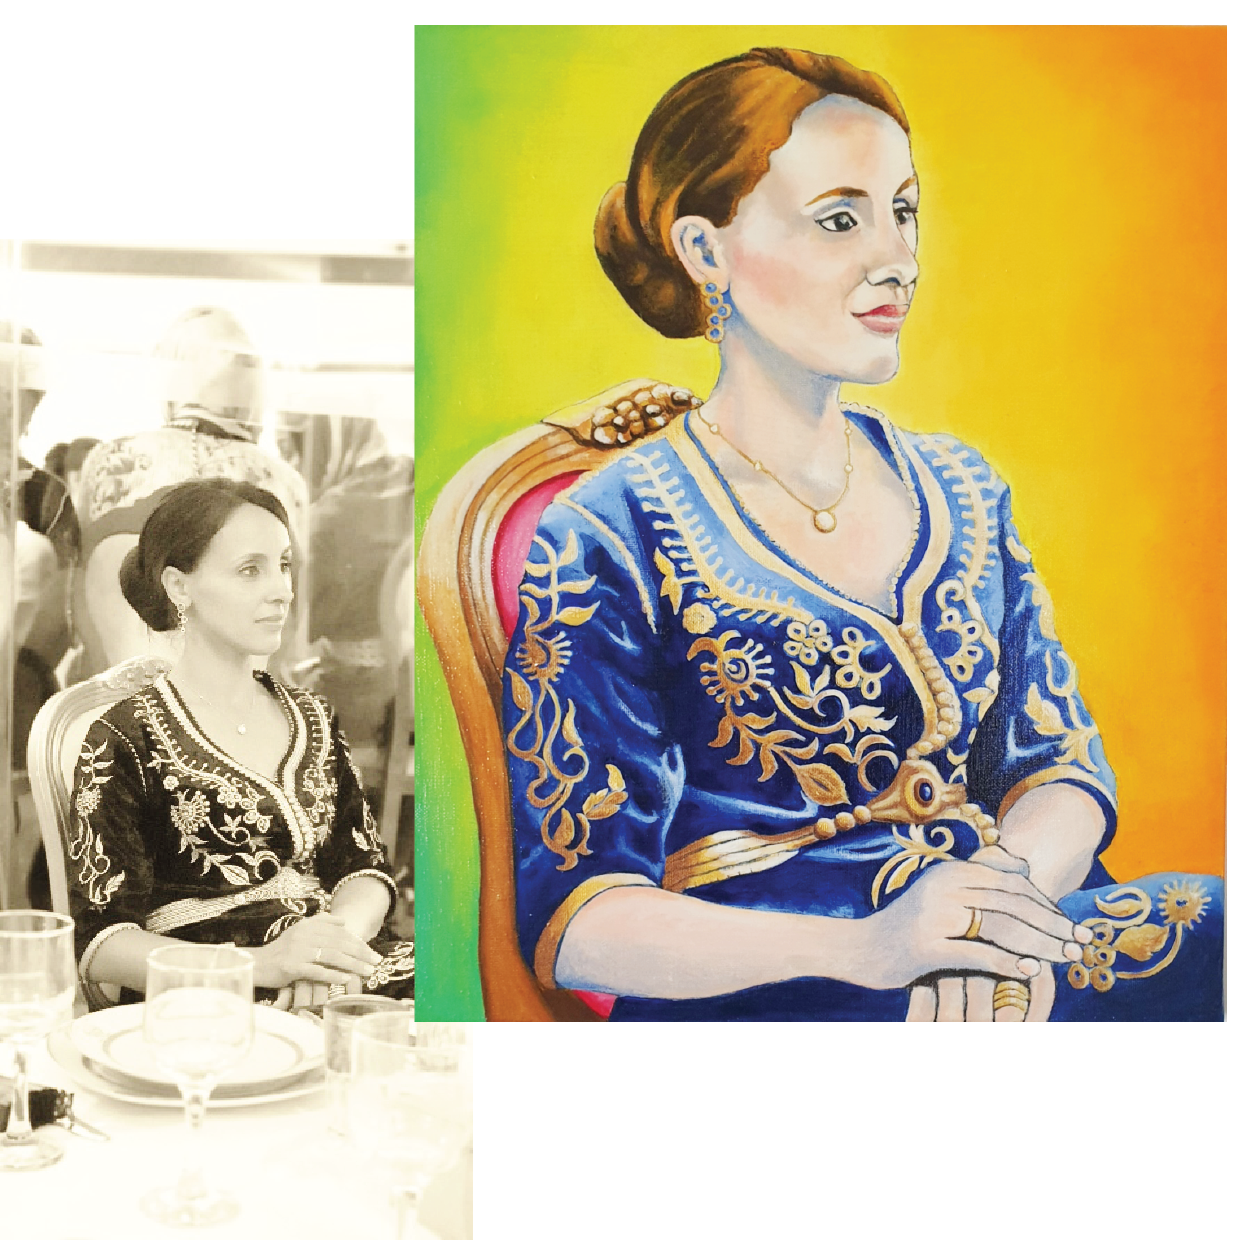 Fatima avant/après